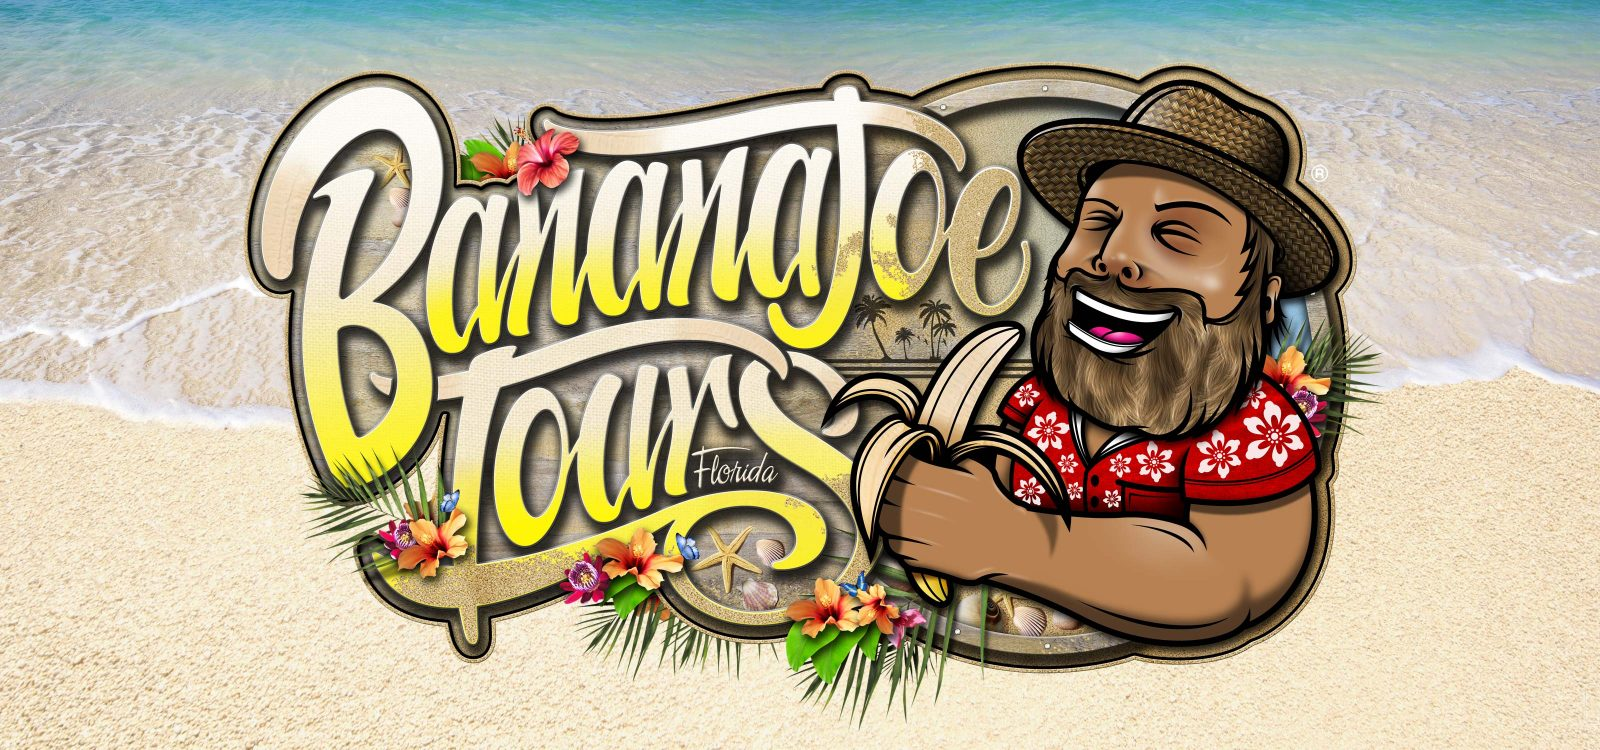 banana-joe-tours-florida-story